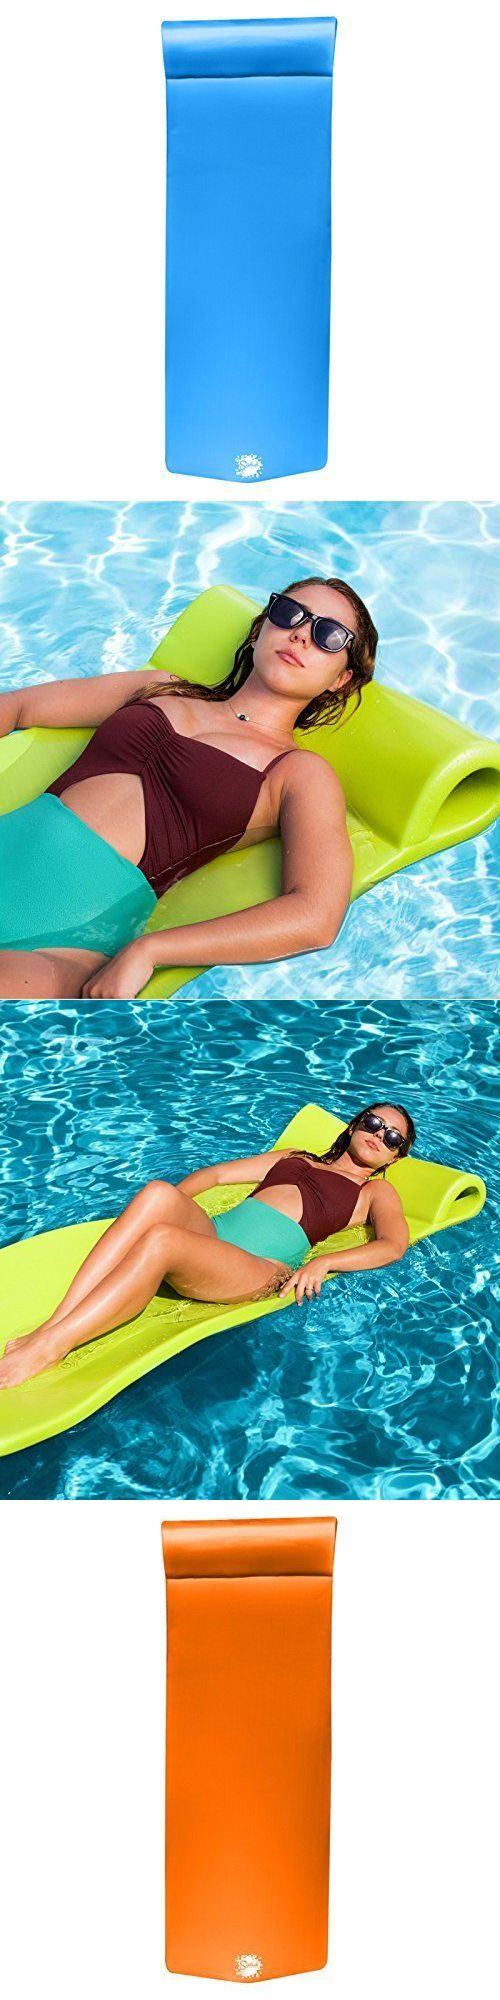 Floats Rafts 145988: Trc Recreation Splash Pool Float Kool Lime Green Floating Lounger Seats, New -> BUY IT NOW ONLY: $171.94 on eBay!